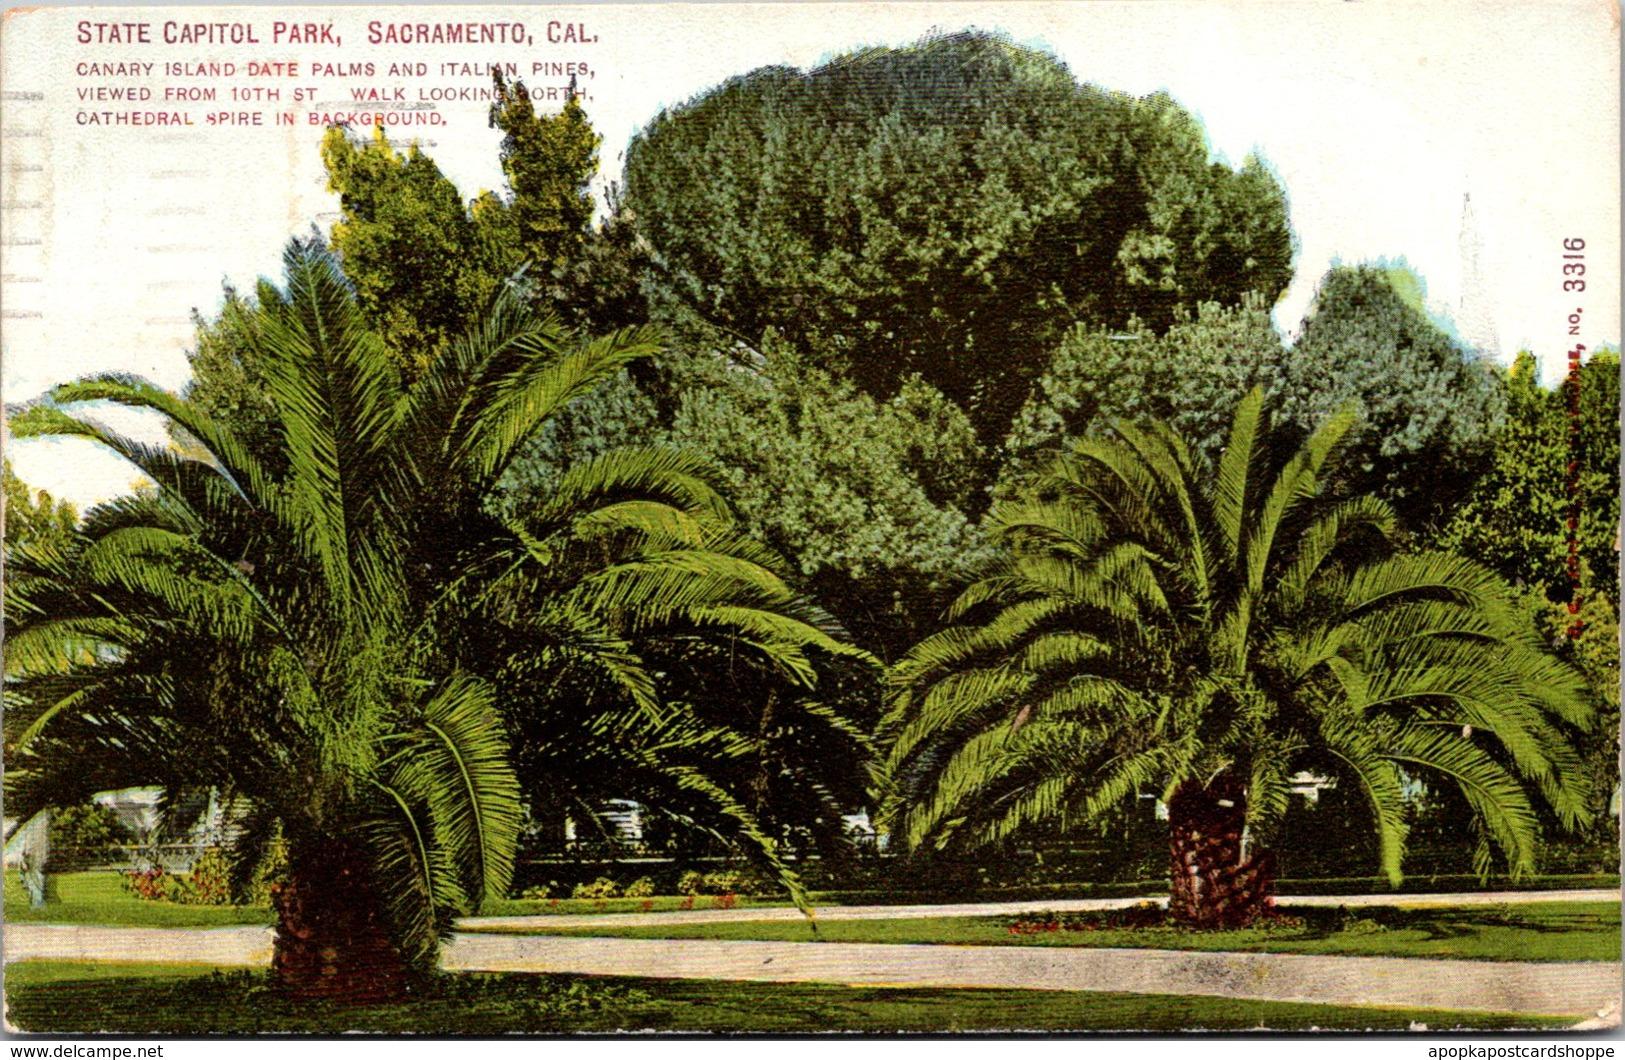 California Sacramento State Capitol Park Canary Island Date Palms and Italian...